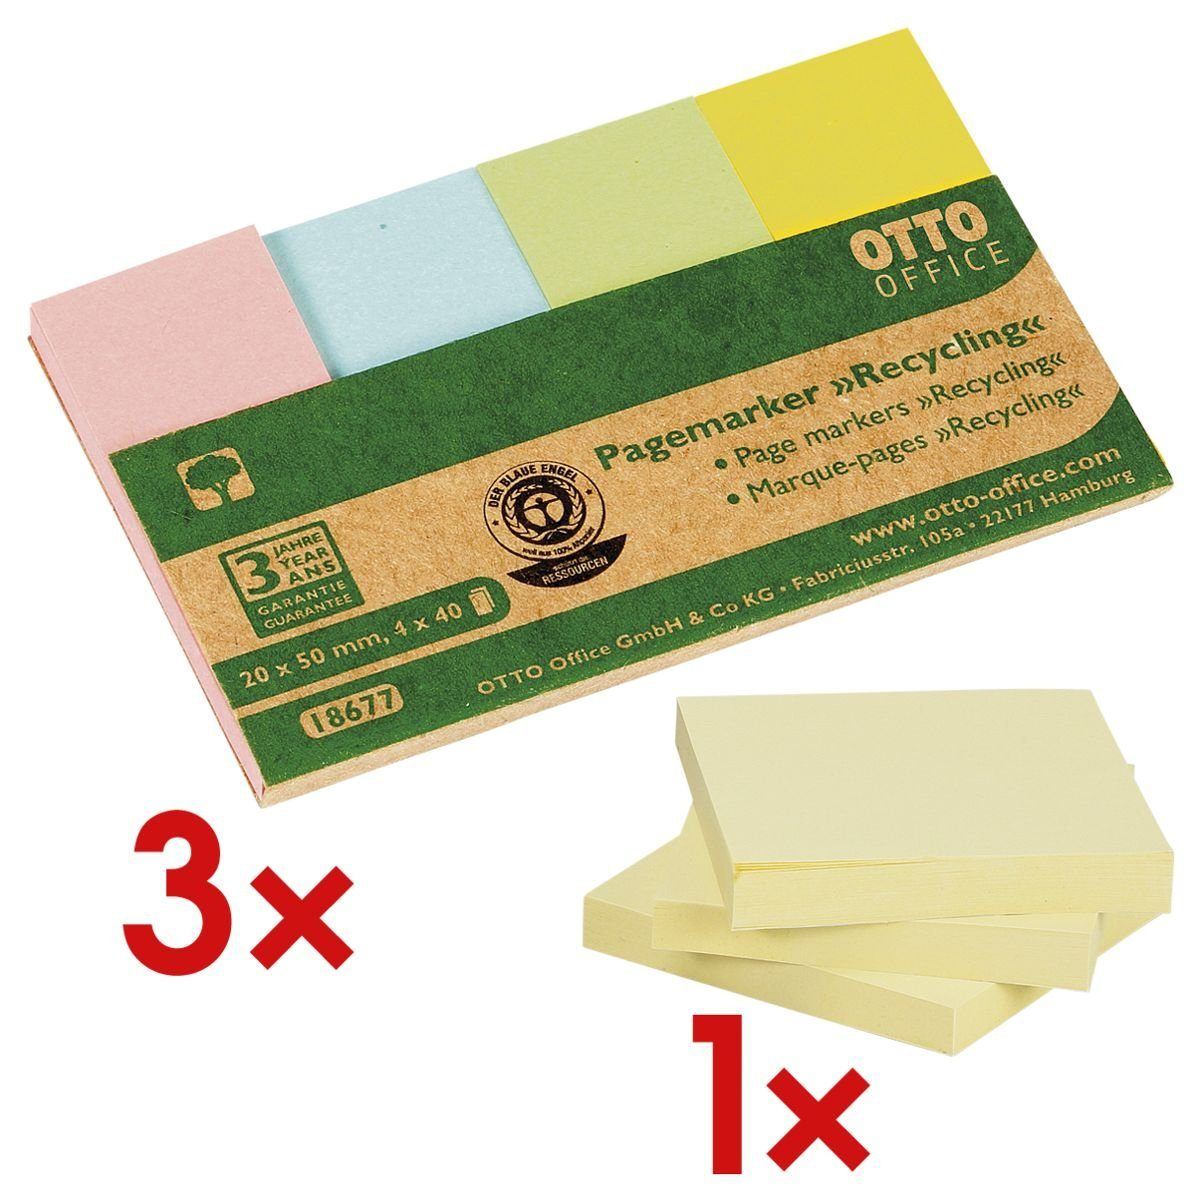 OTTOOFFICE NATURE 3x Pagemarker 20 x 50 mm inkl. 3er-Pack Haftnotizblock »Recycling« 1 Set